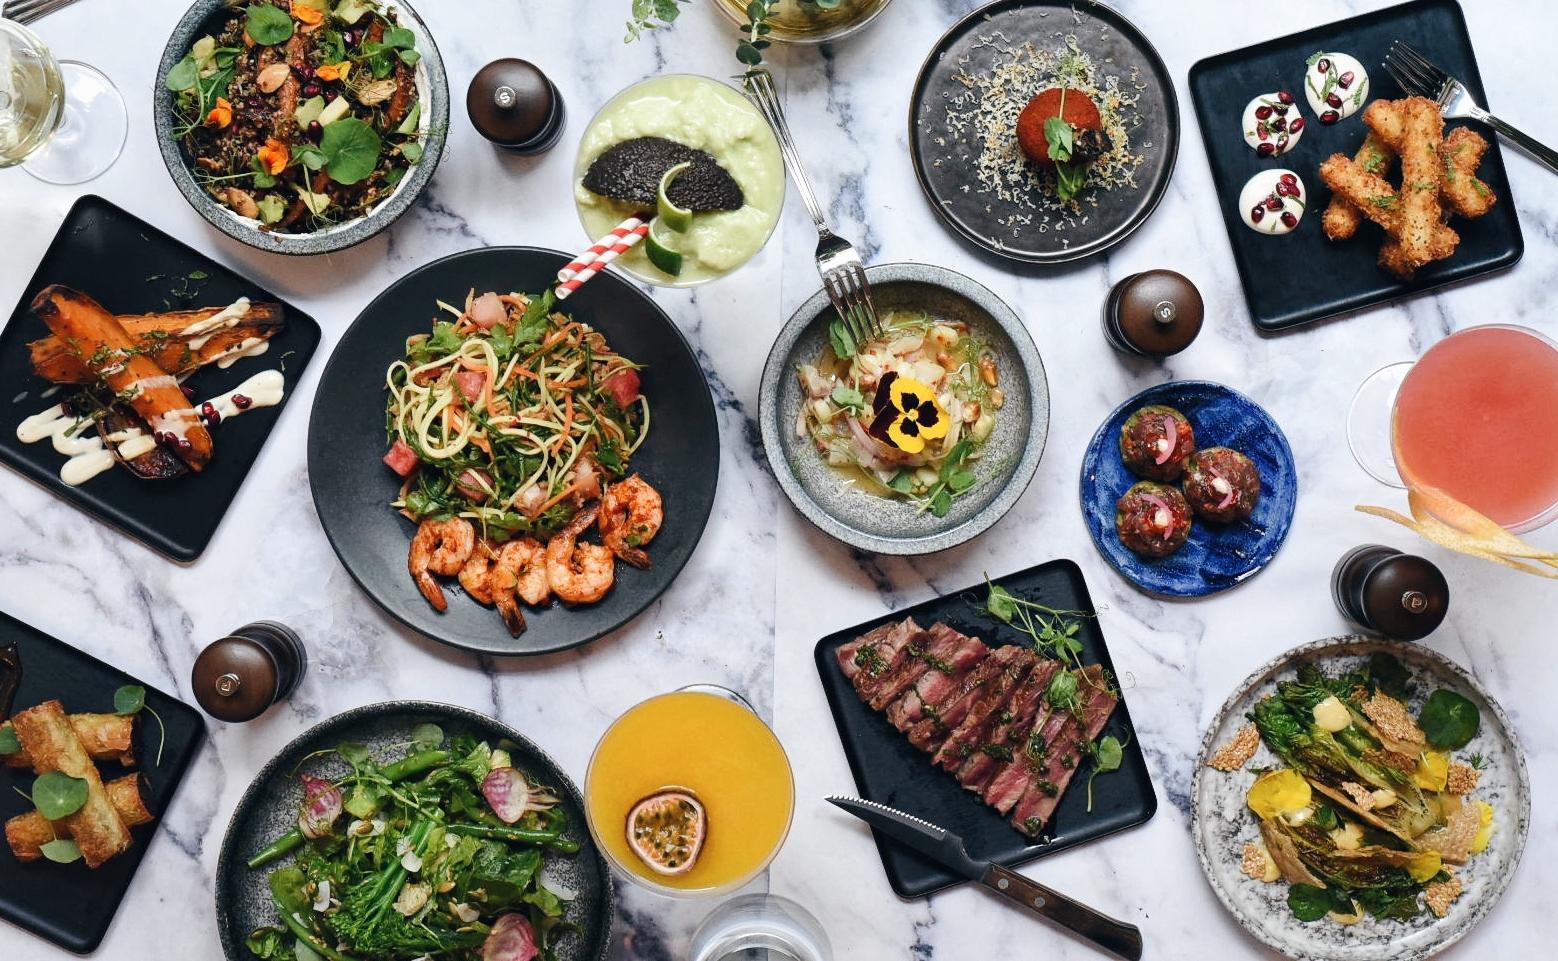 Group-Dinner-Shot-1-Photo-Credits-Leyla-Kazim-optimised.jpg